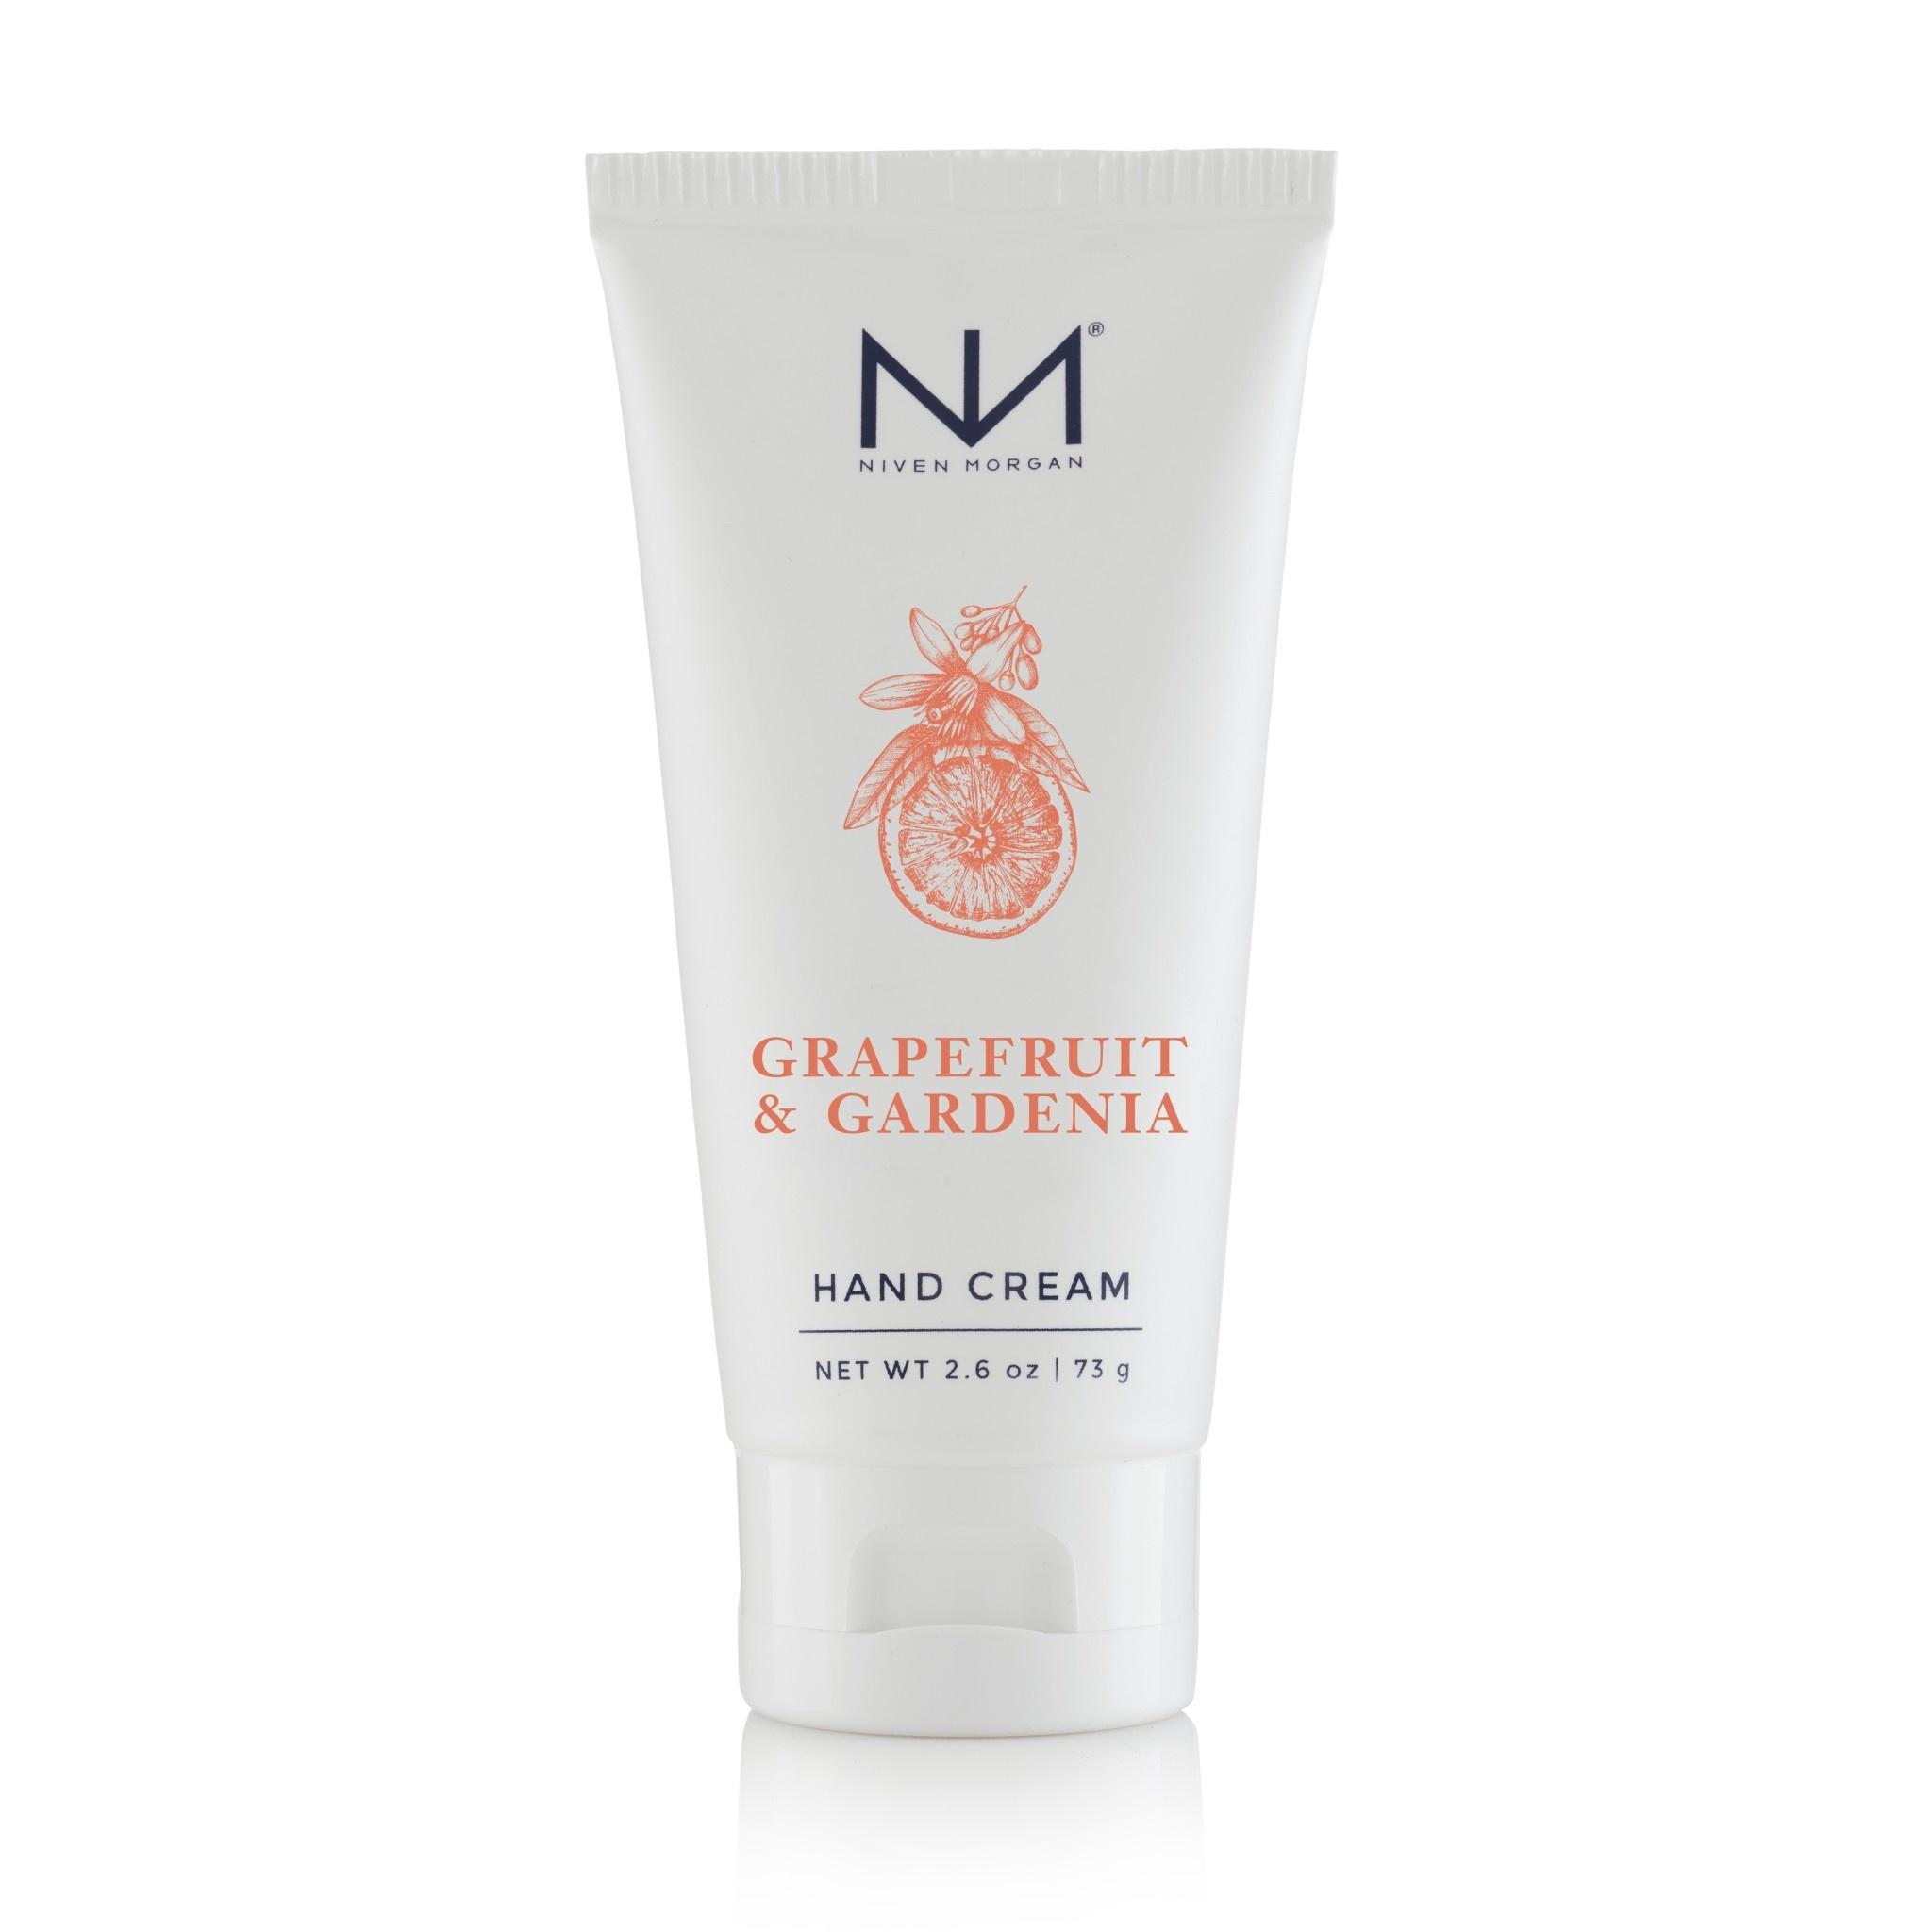 Niven Morgan Grapefruit & Gardenia 2.6oz Travel Hand Cream